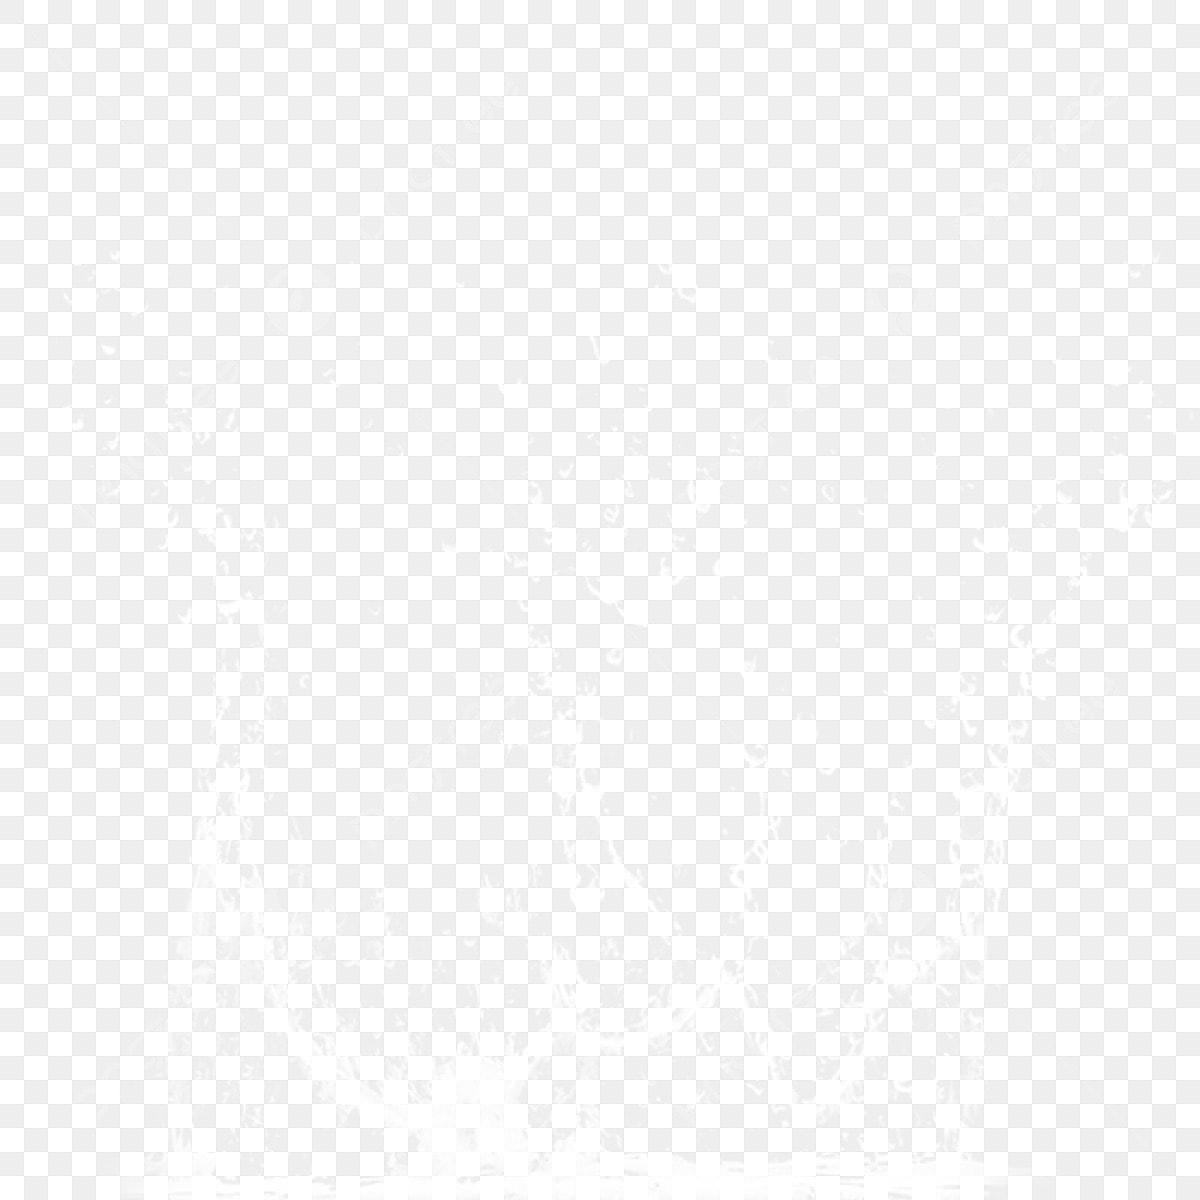 Ocean Water Splash Png